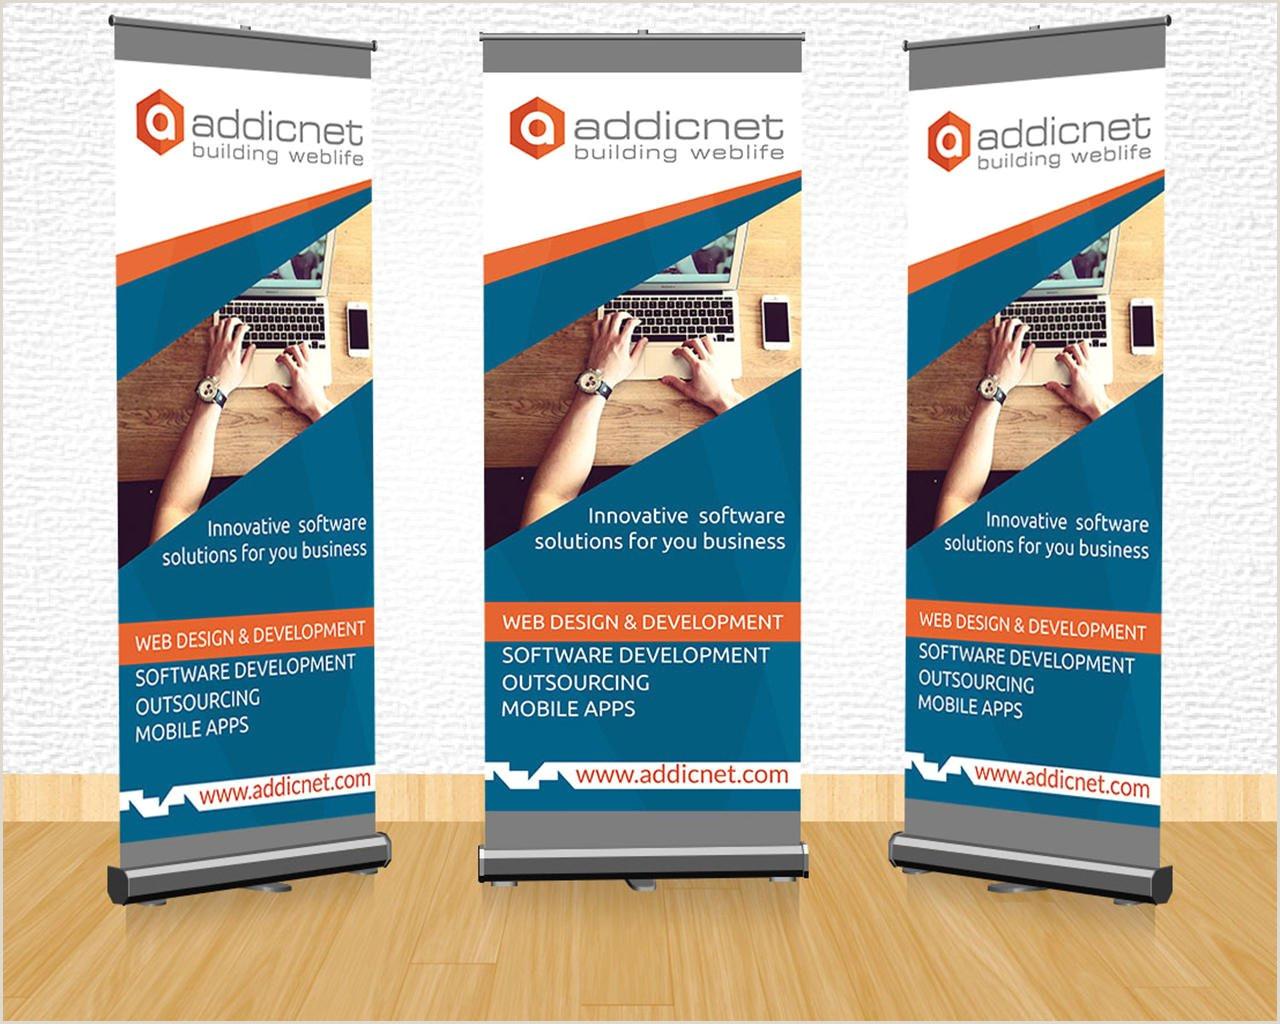 Retractable Banner Designs Roll Up Modern Design By Sremac On Envato Studio